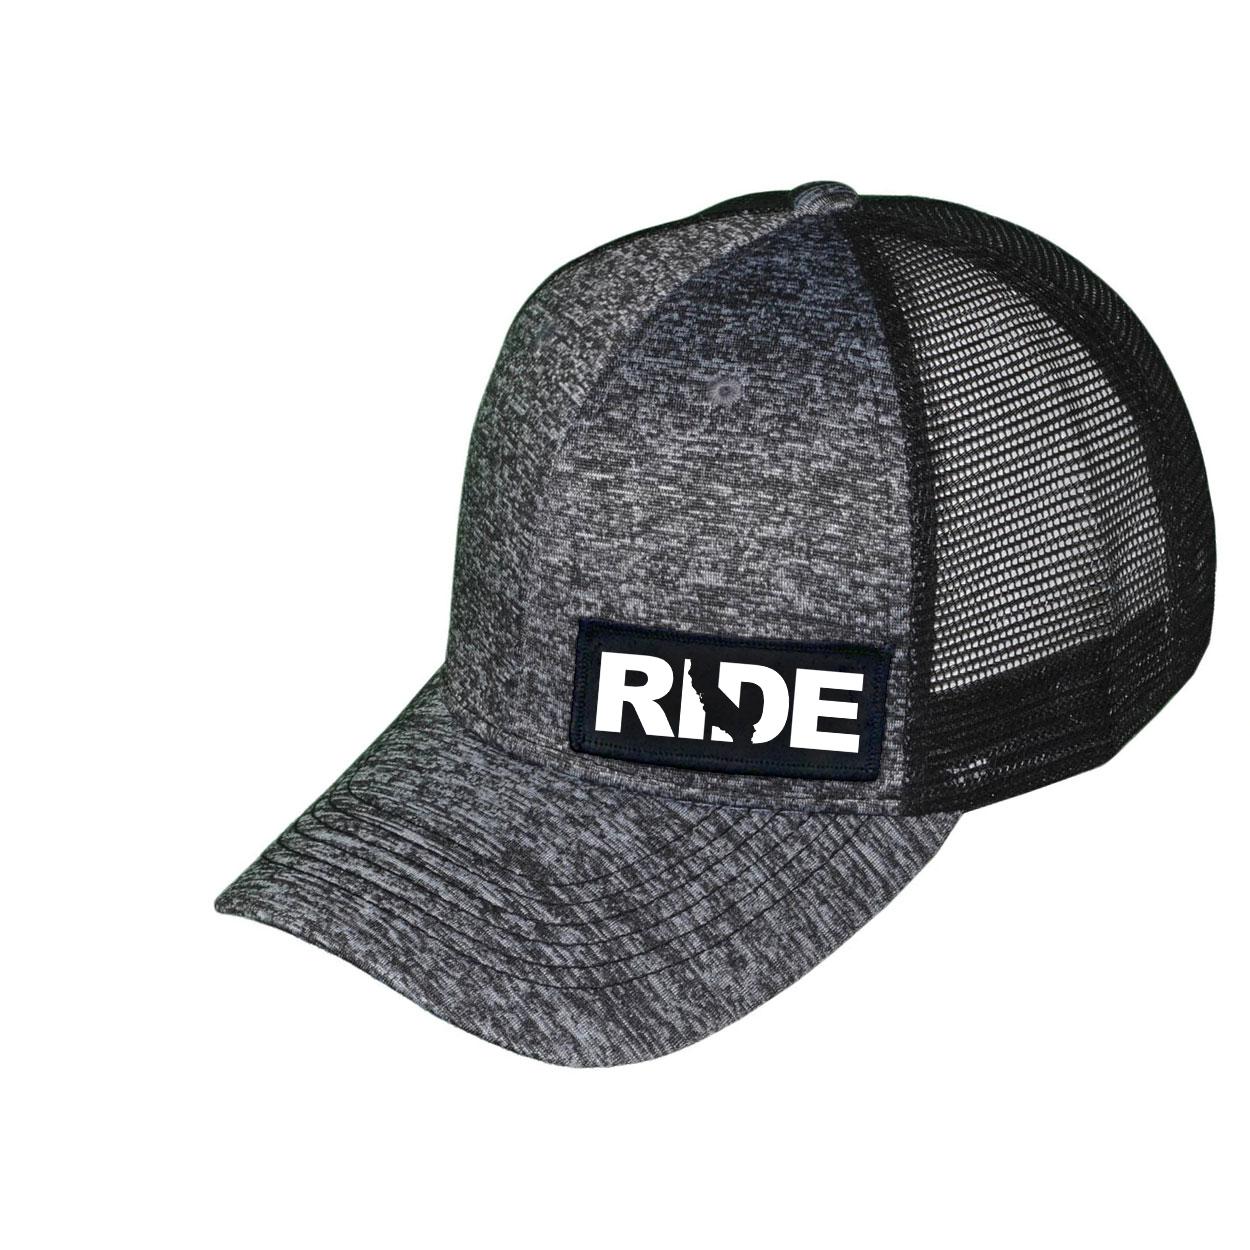 Ride California Night Out Woven Patch Melange Snapback Trucker Hat Gray/Black (White Logo)